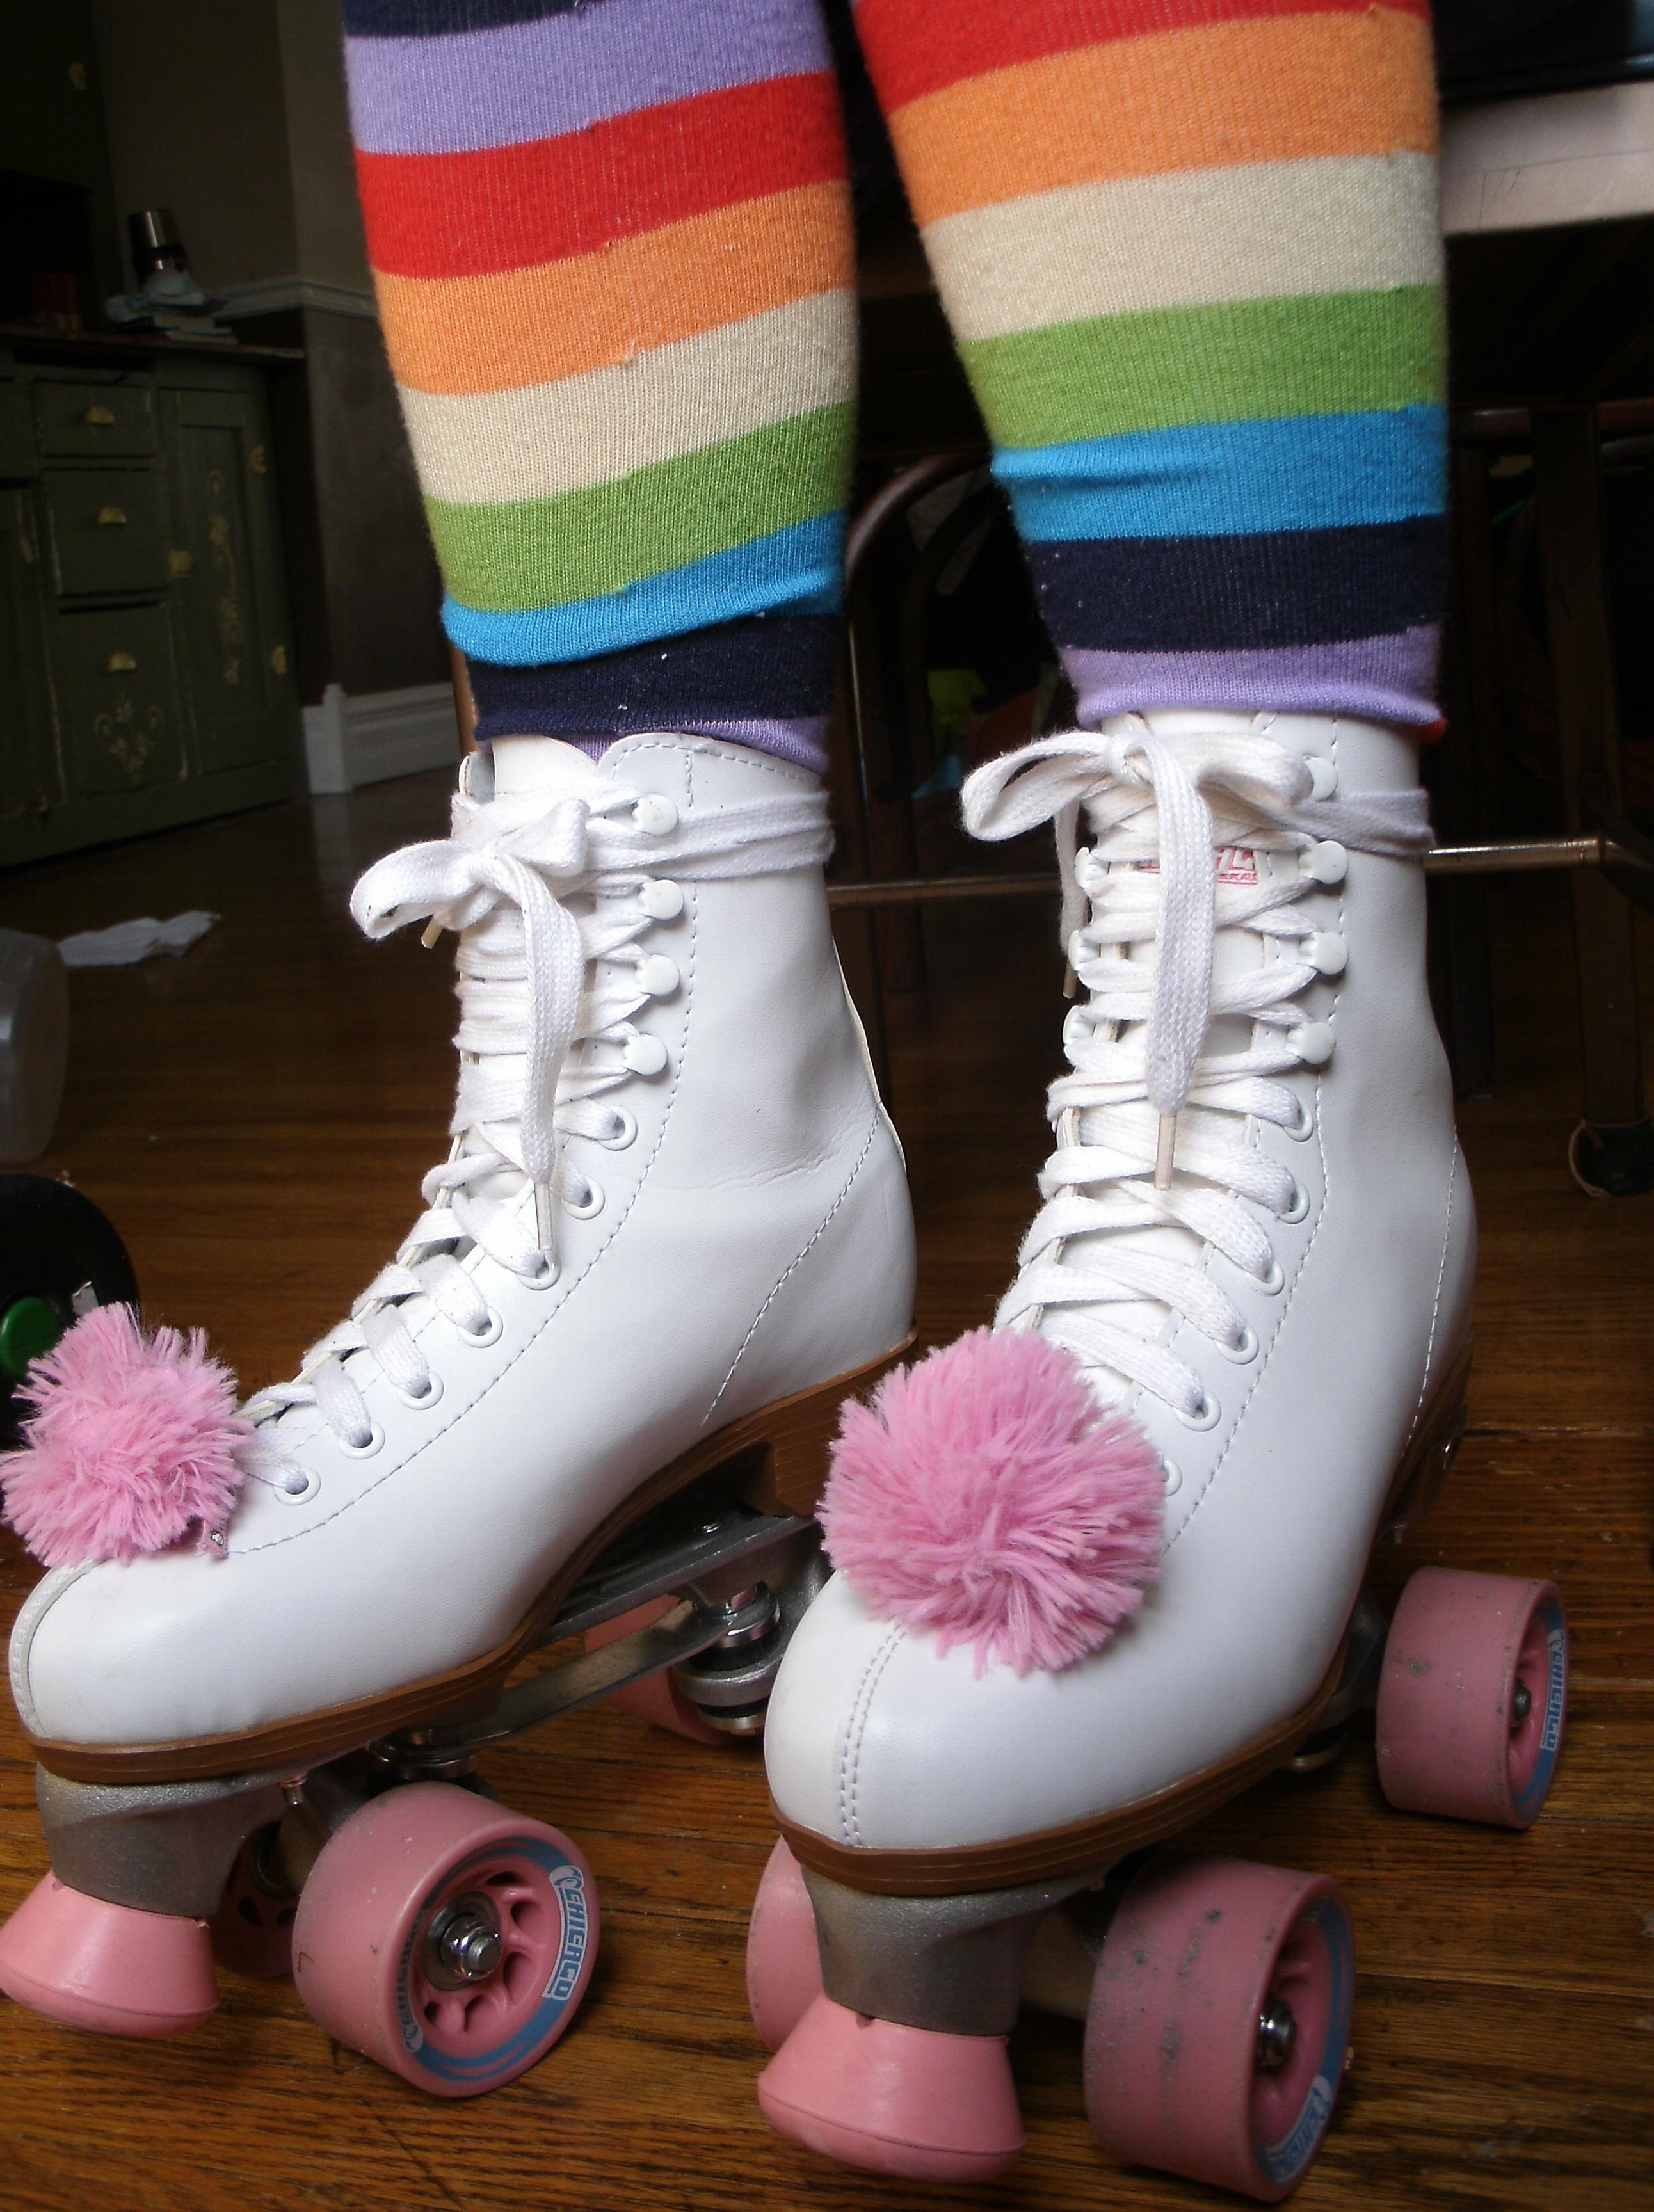 Roller skating rink quad cities - Roller Skating Rink Quad Cities 45